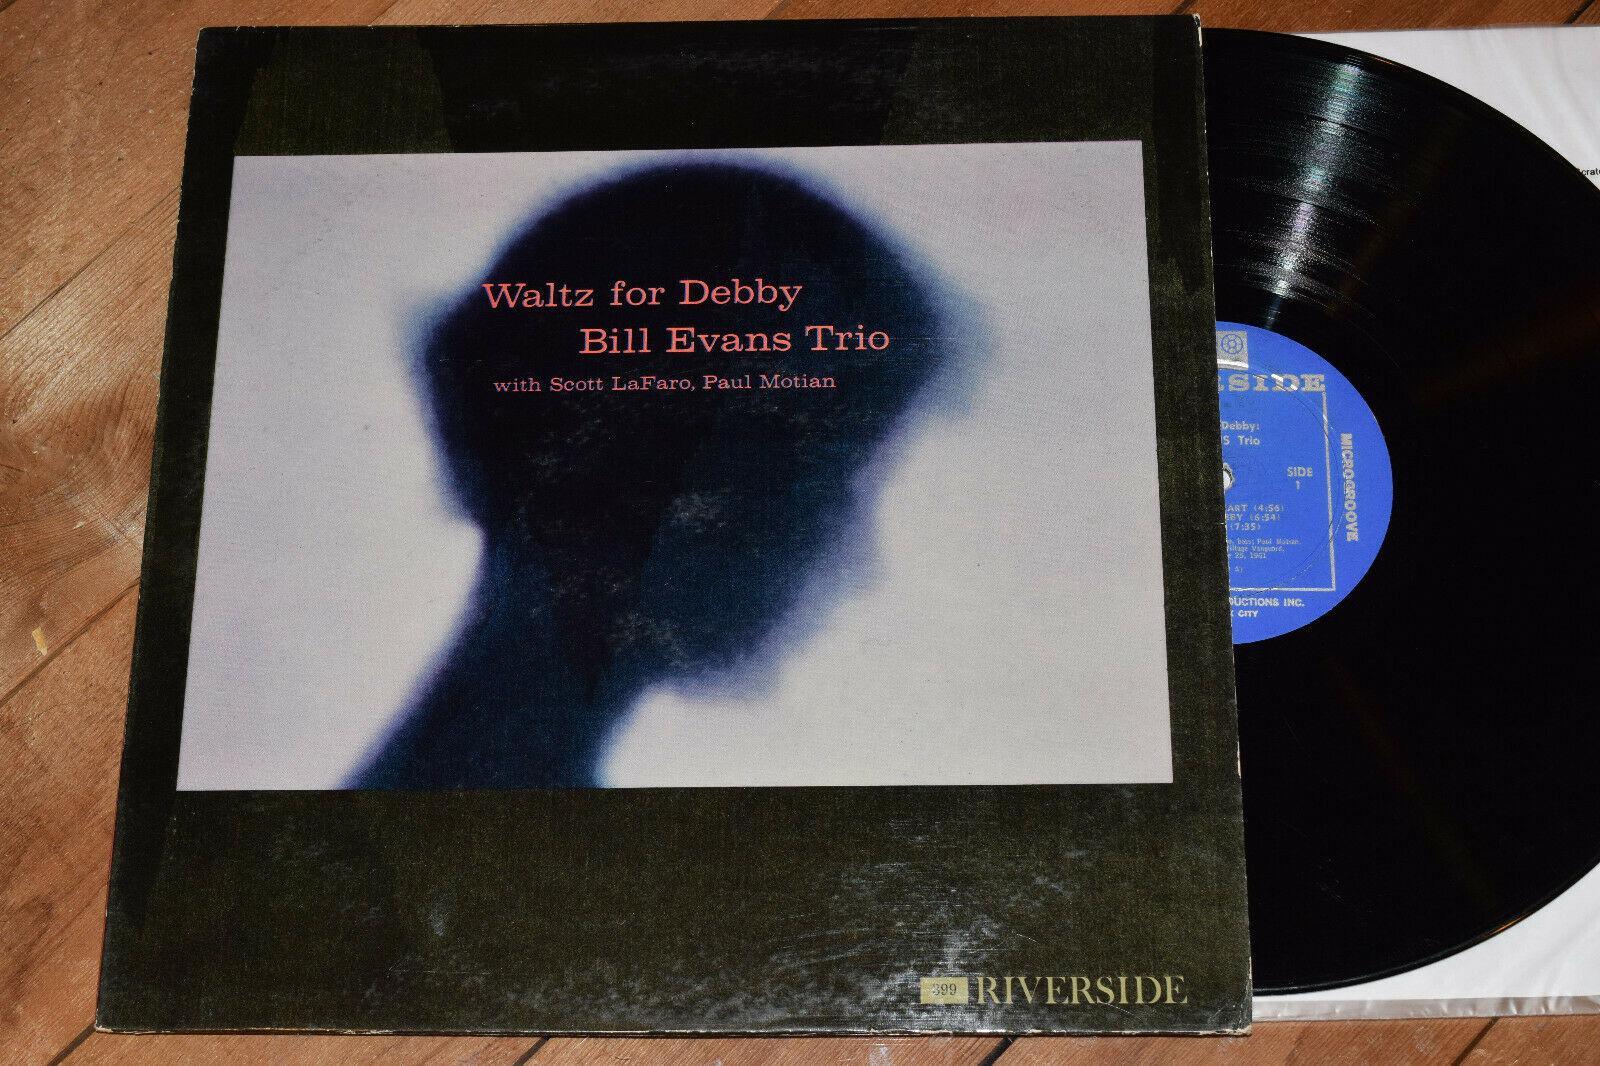 Bill Evans Trio Waltz For Debby PLAYS EX  1st DG Riverside lp 399 Scott La Faro